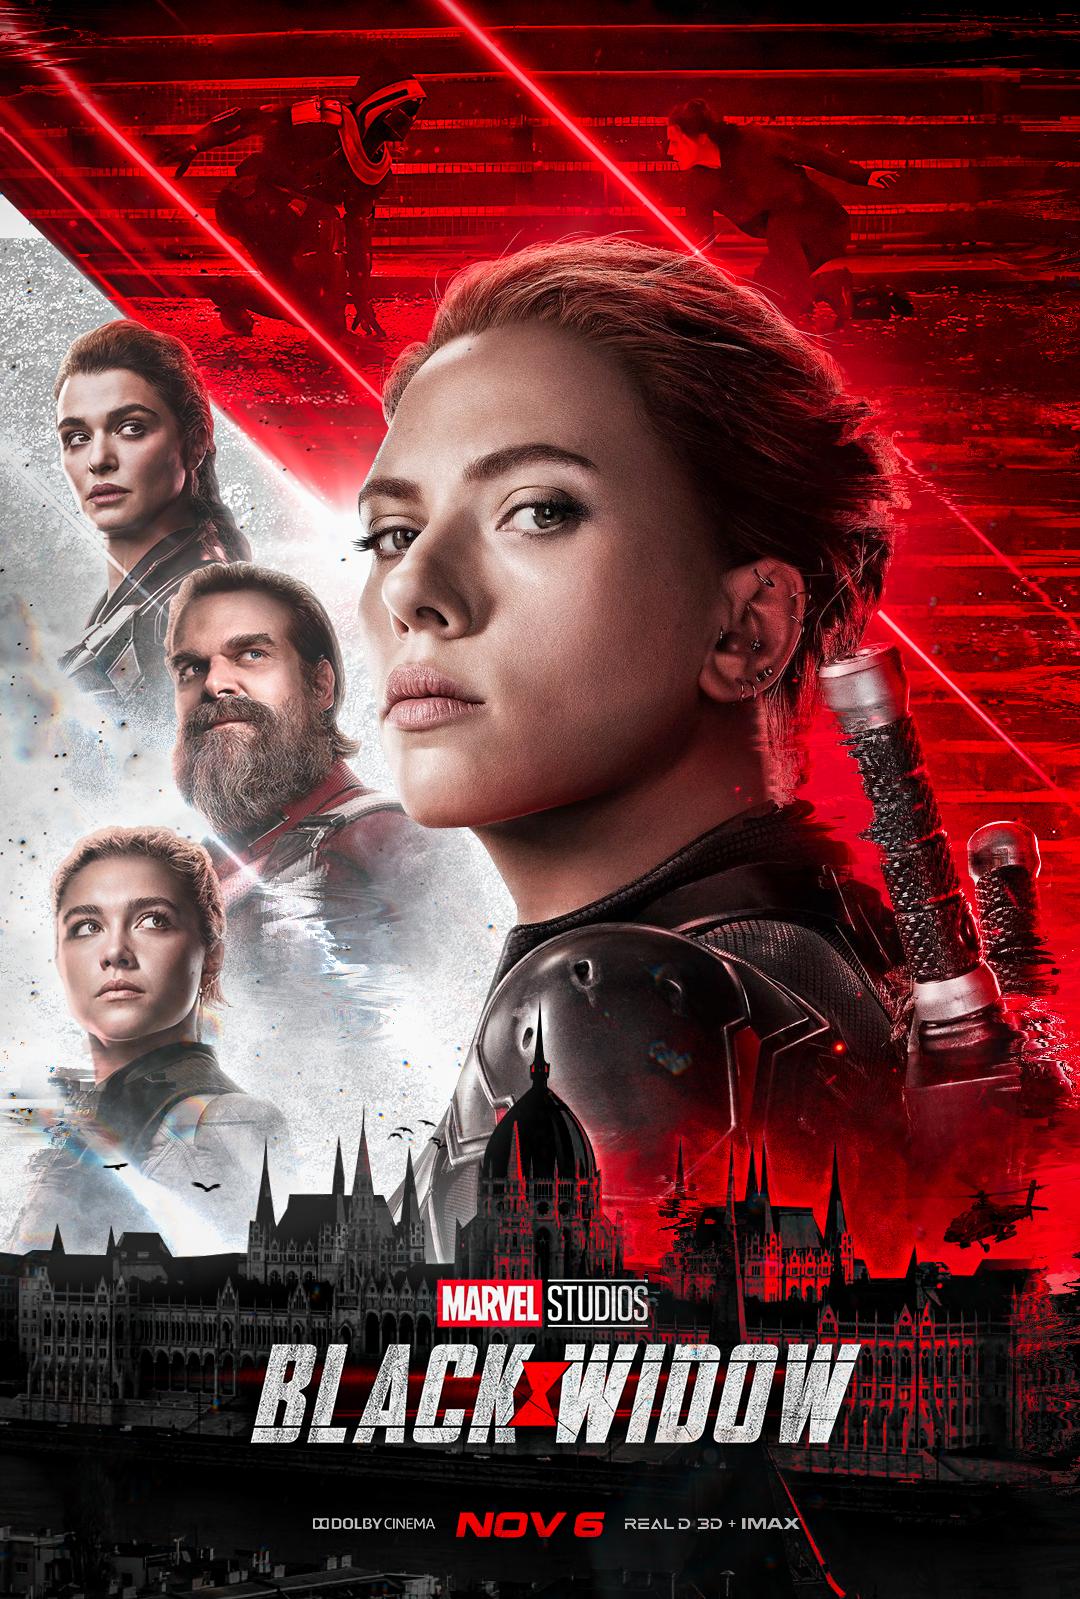 Black Widow Movie Poster by Mixo